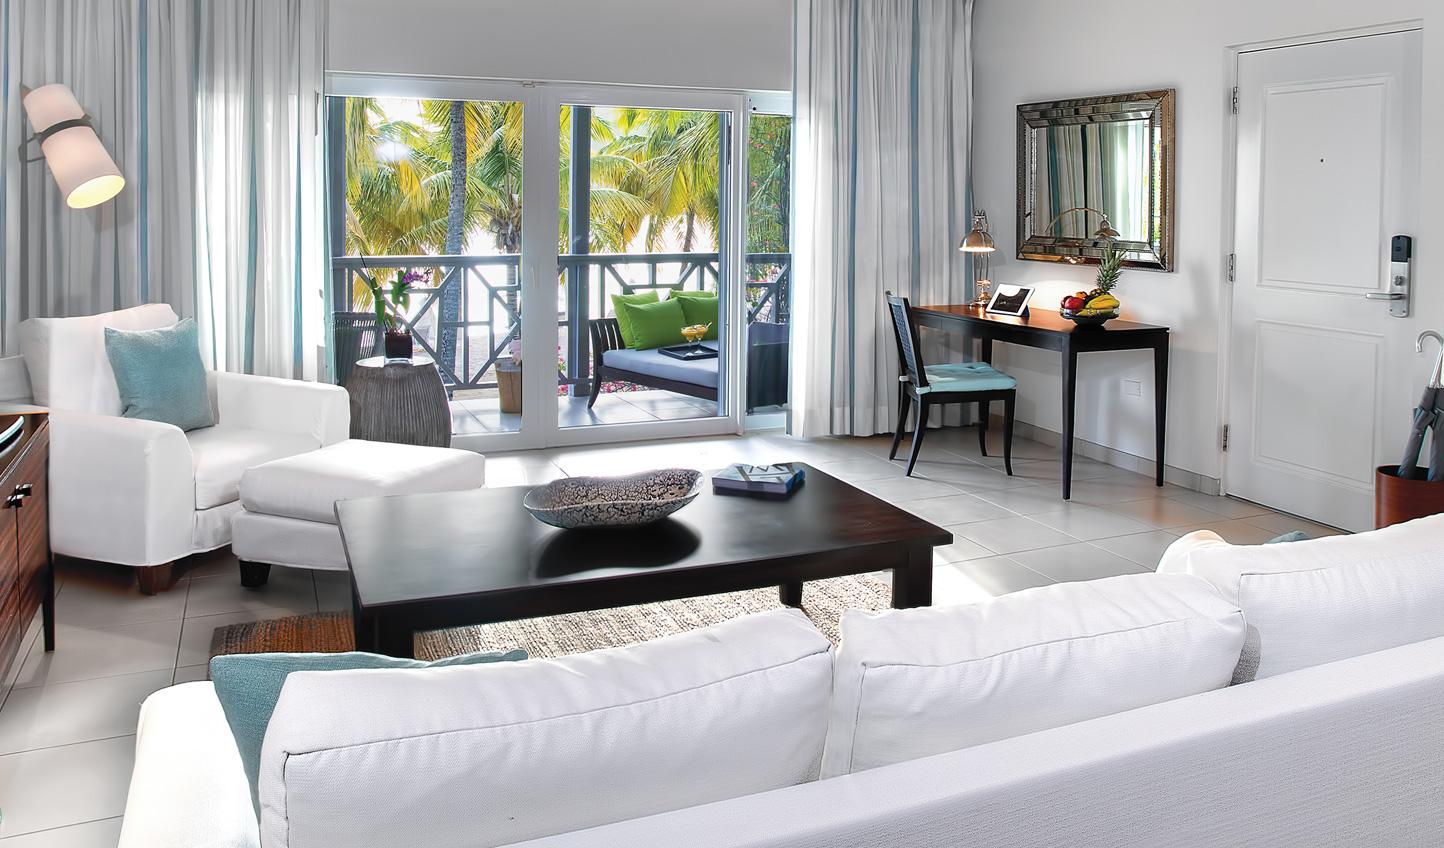 A neutral colour scheme highlights the tropical hues outside